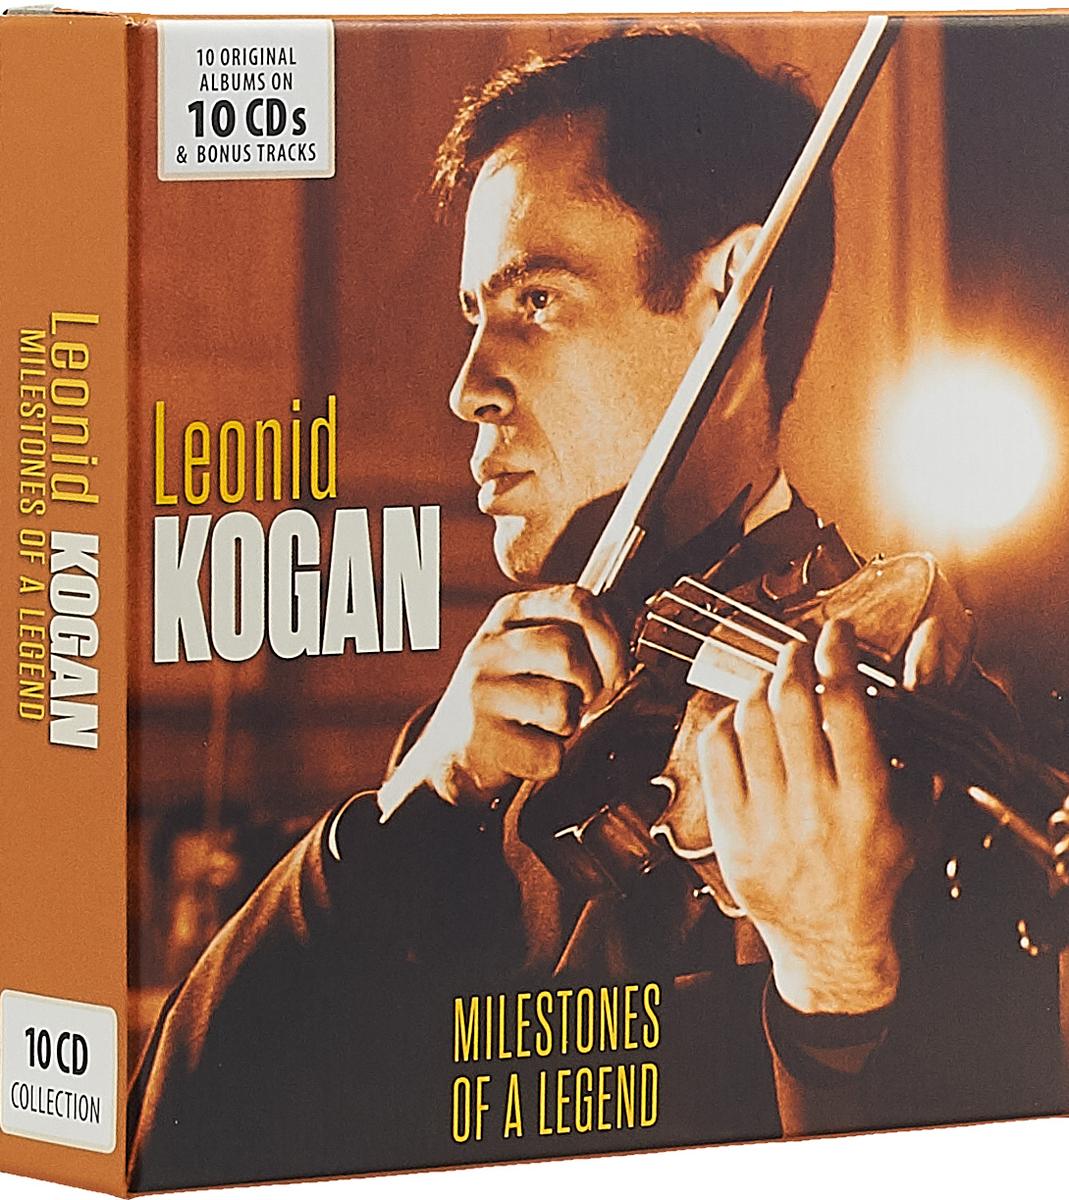 Леонид Коган Leonid Kogan. Milestones Of A Legend (10 CD) леонид коган леонид коган том 1